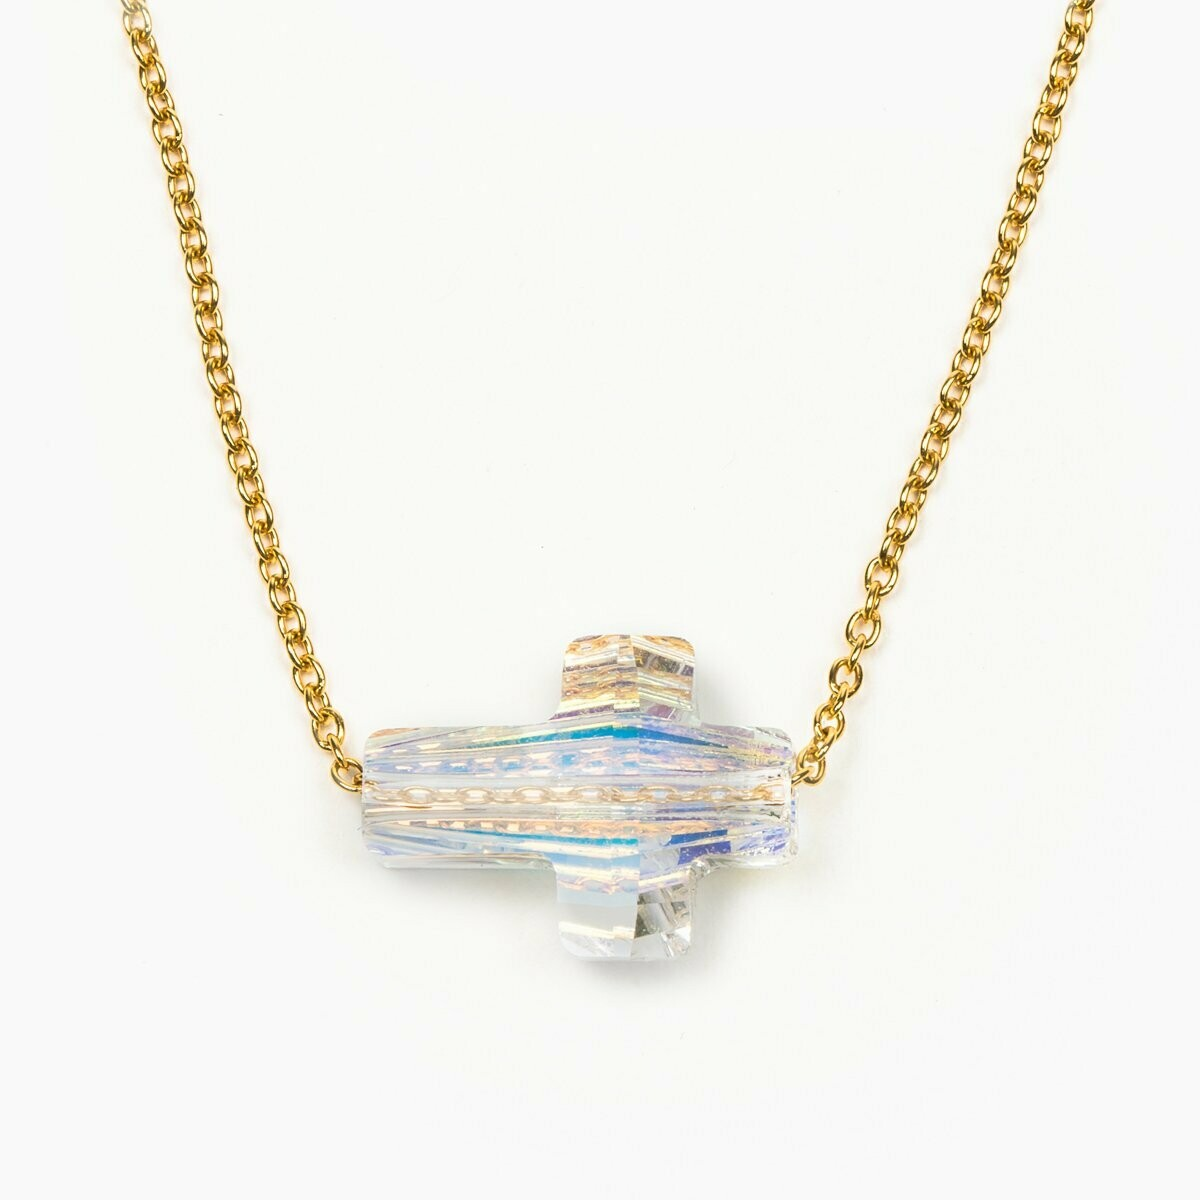 MSMH Heavenly Sky Necklace-Aurora Borealis